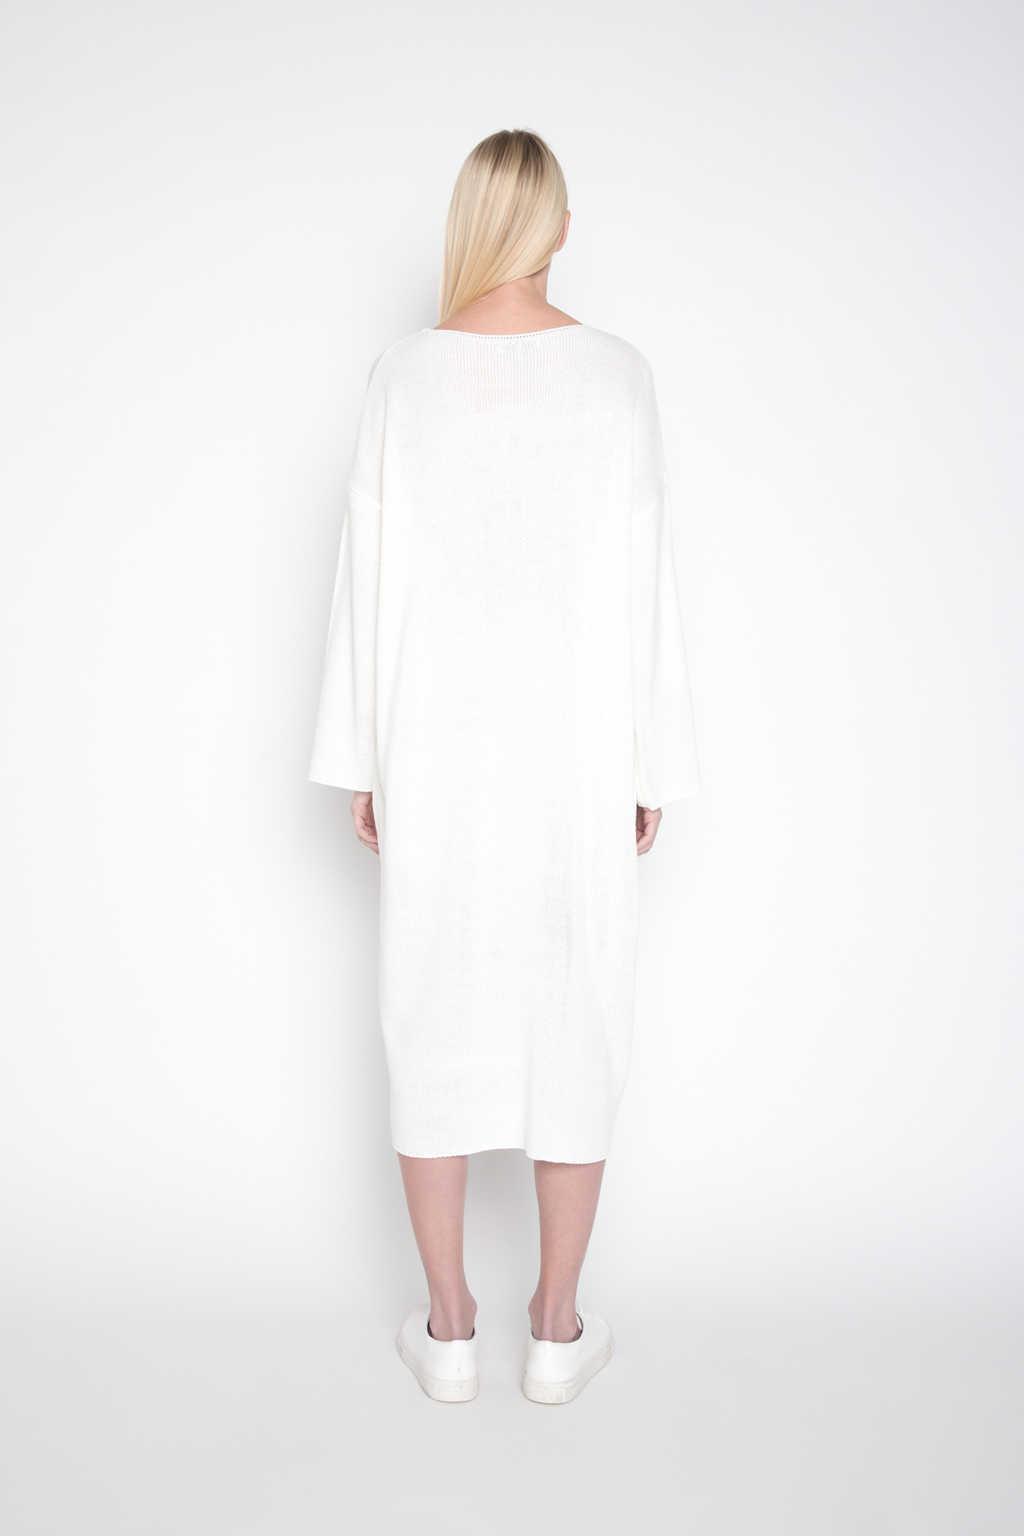 Sweater Dress H003 Cream 4